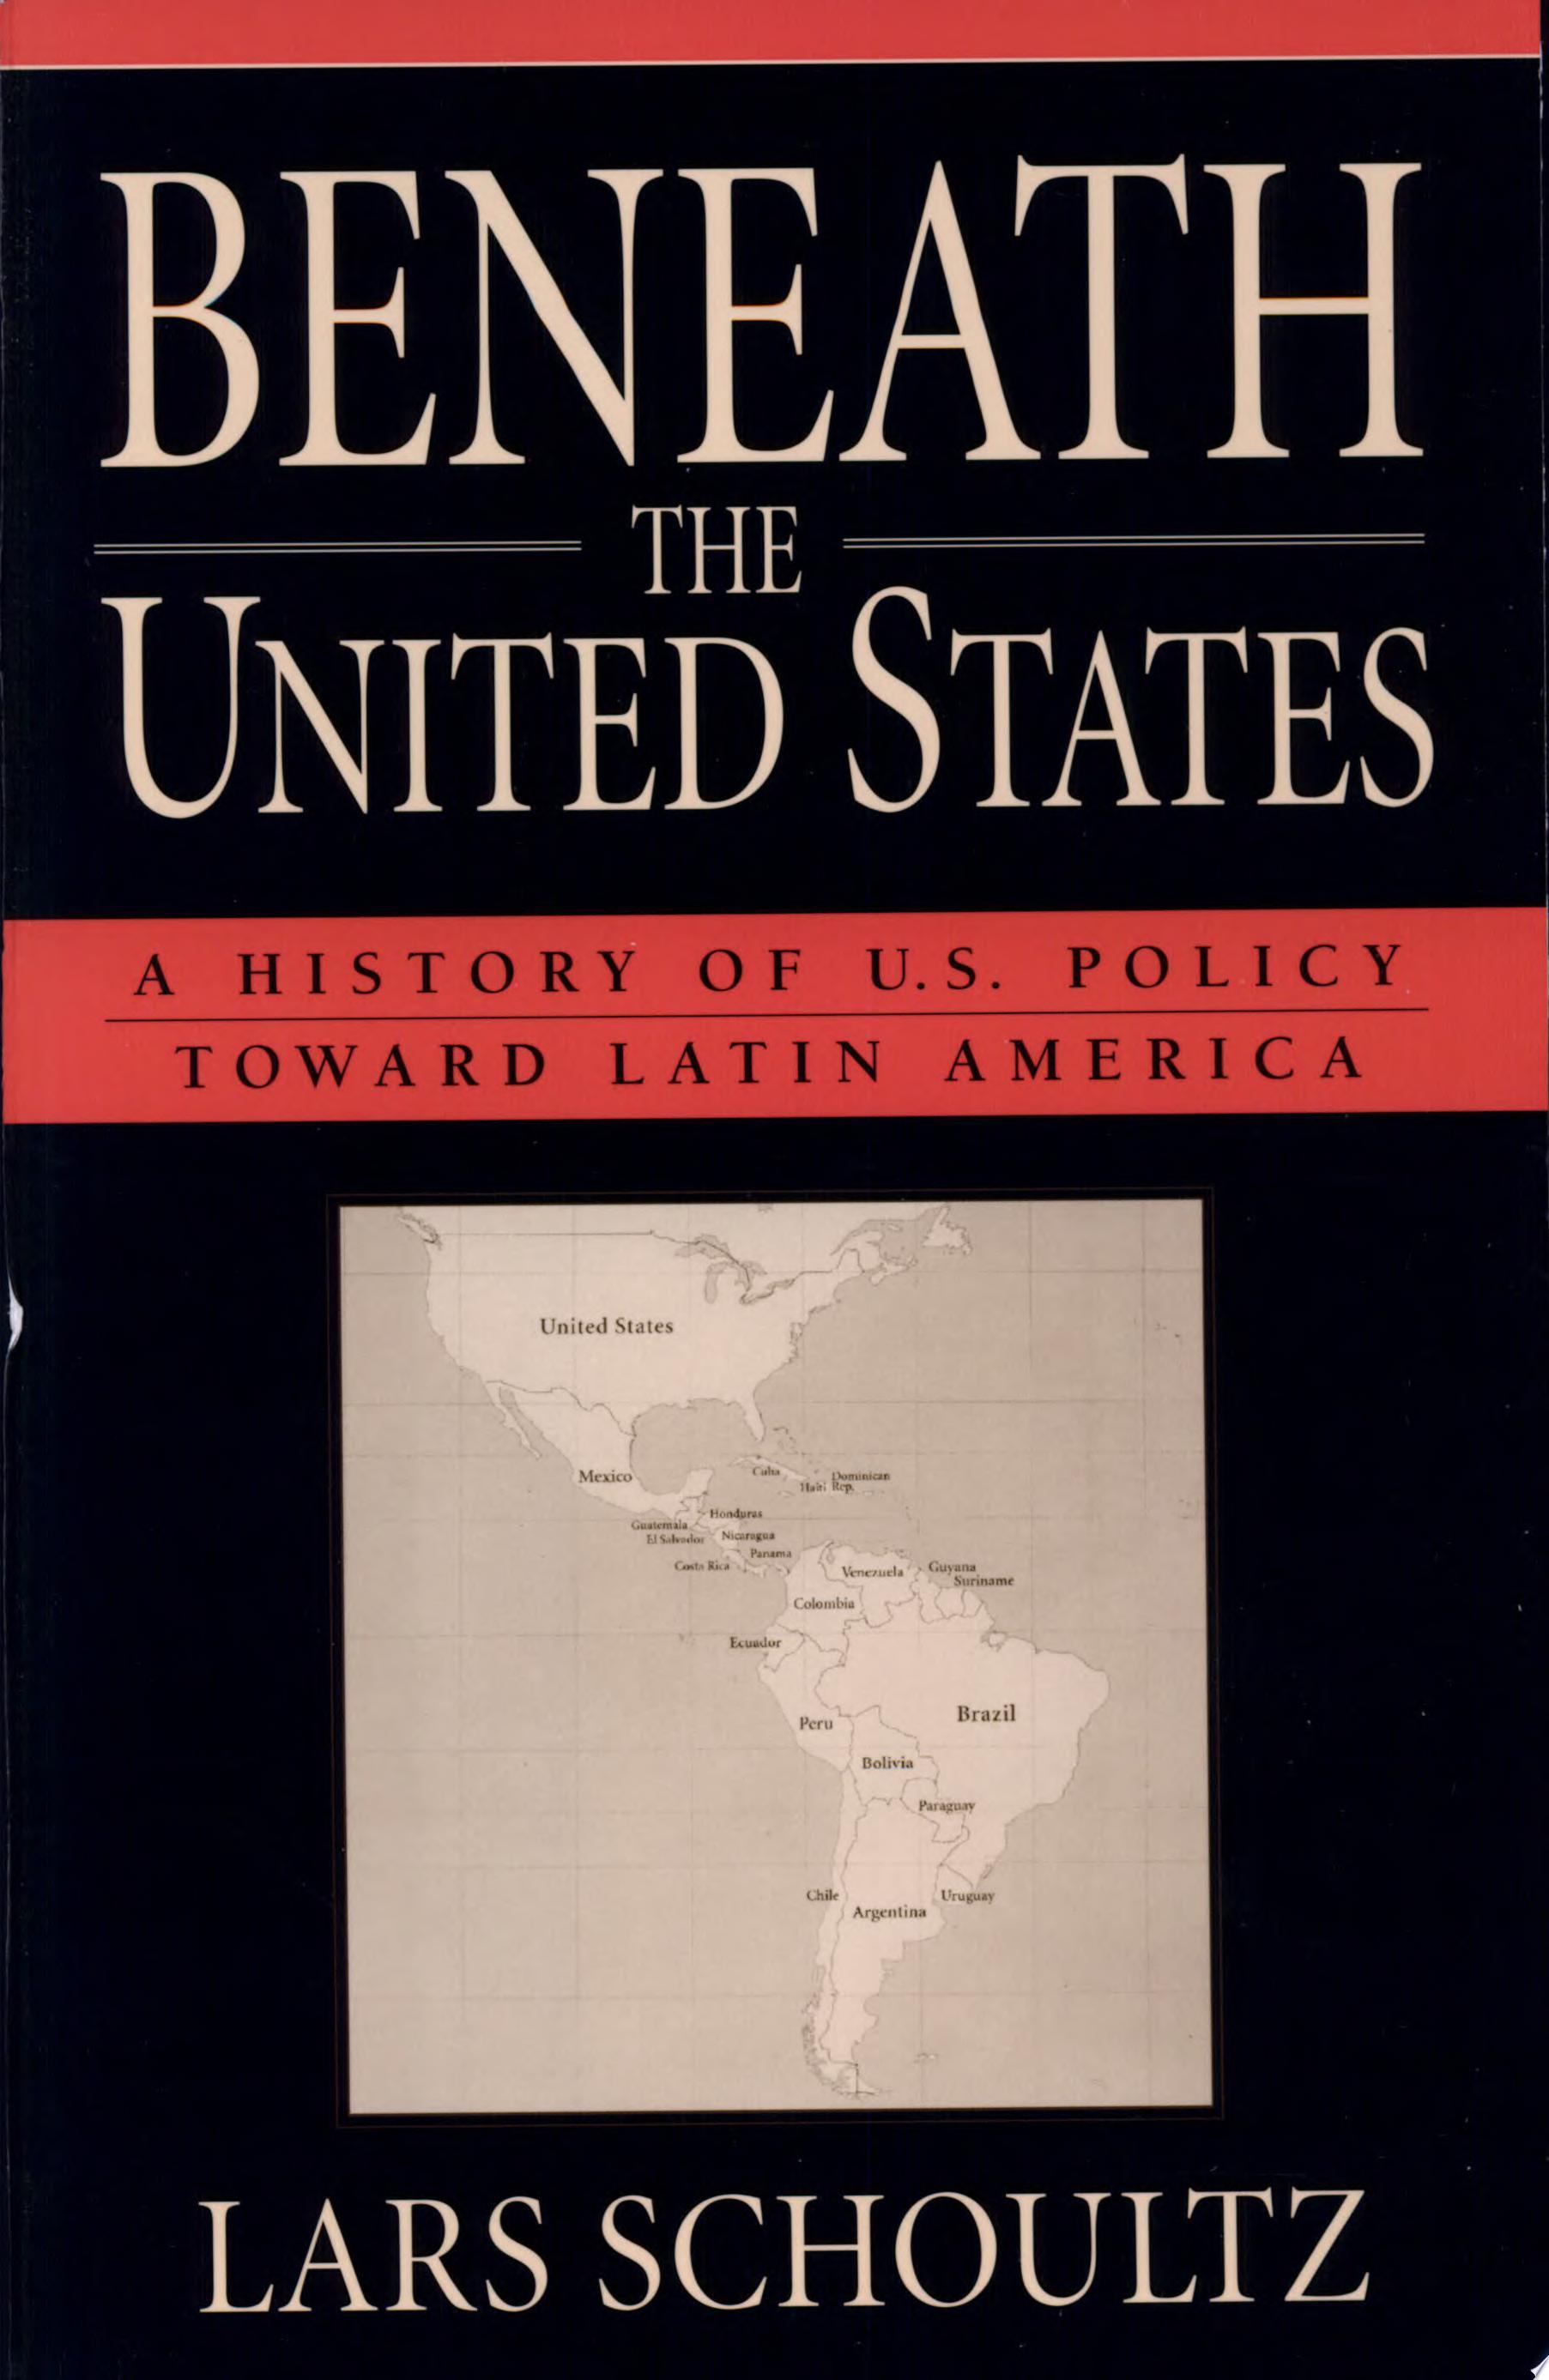 Beneath the United States